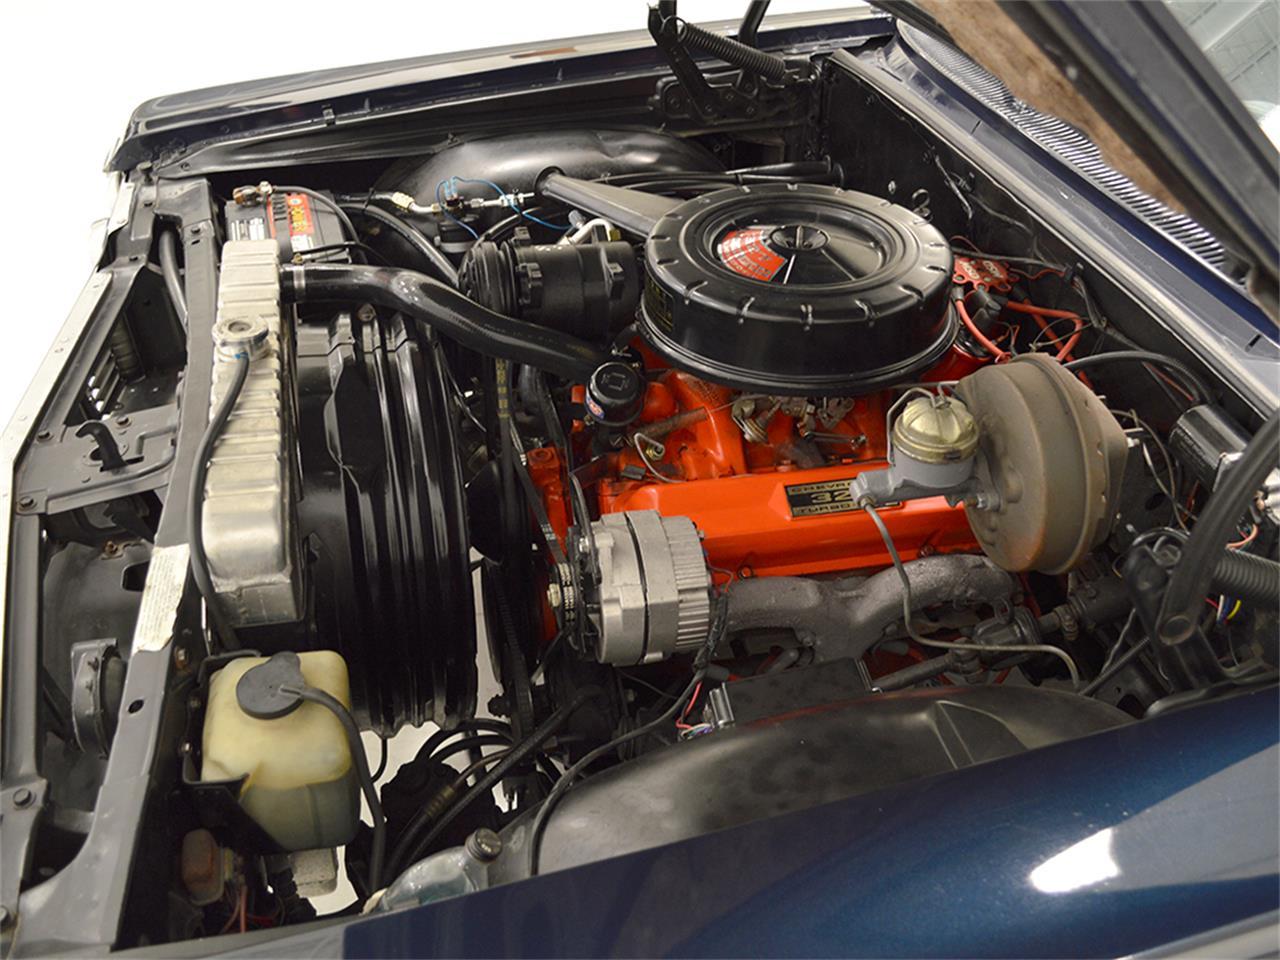 Large Picture of Classic '64 Impala located in Macedonia Ohio - $22,900.00 - LEX8